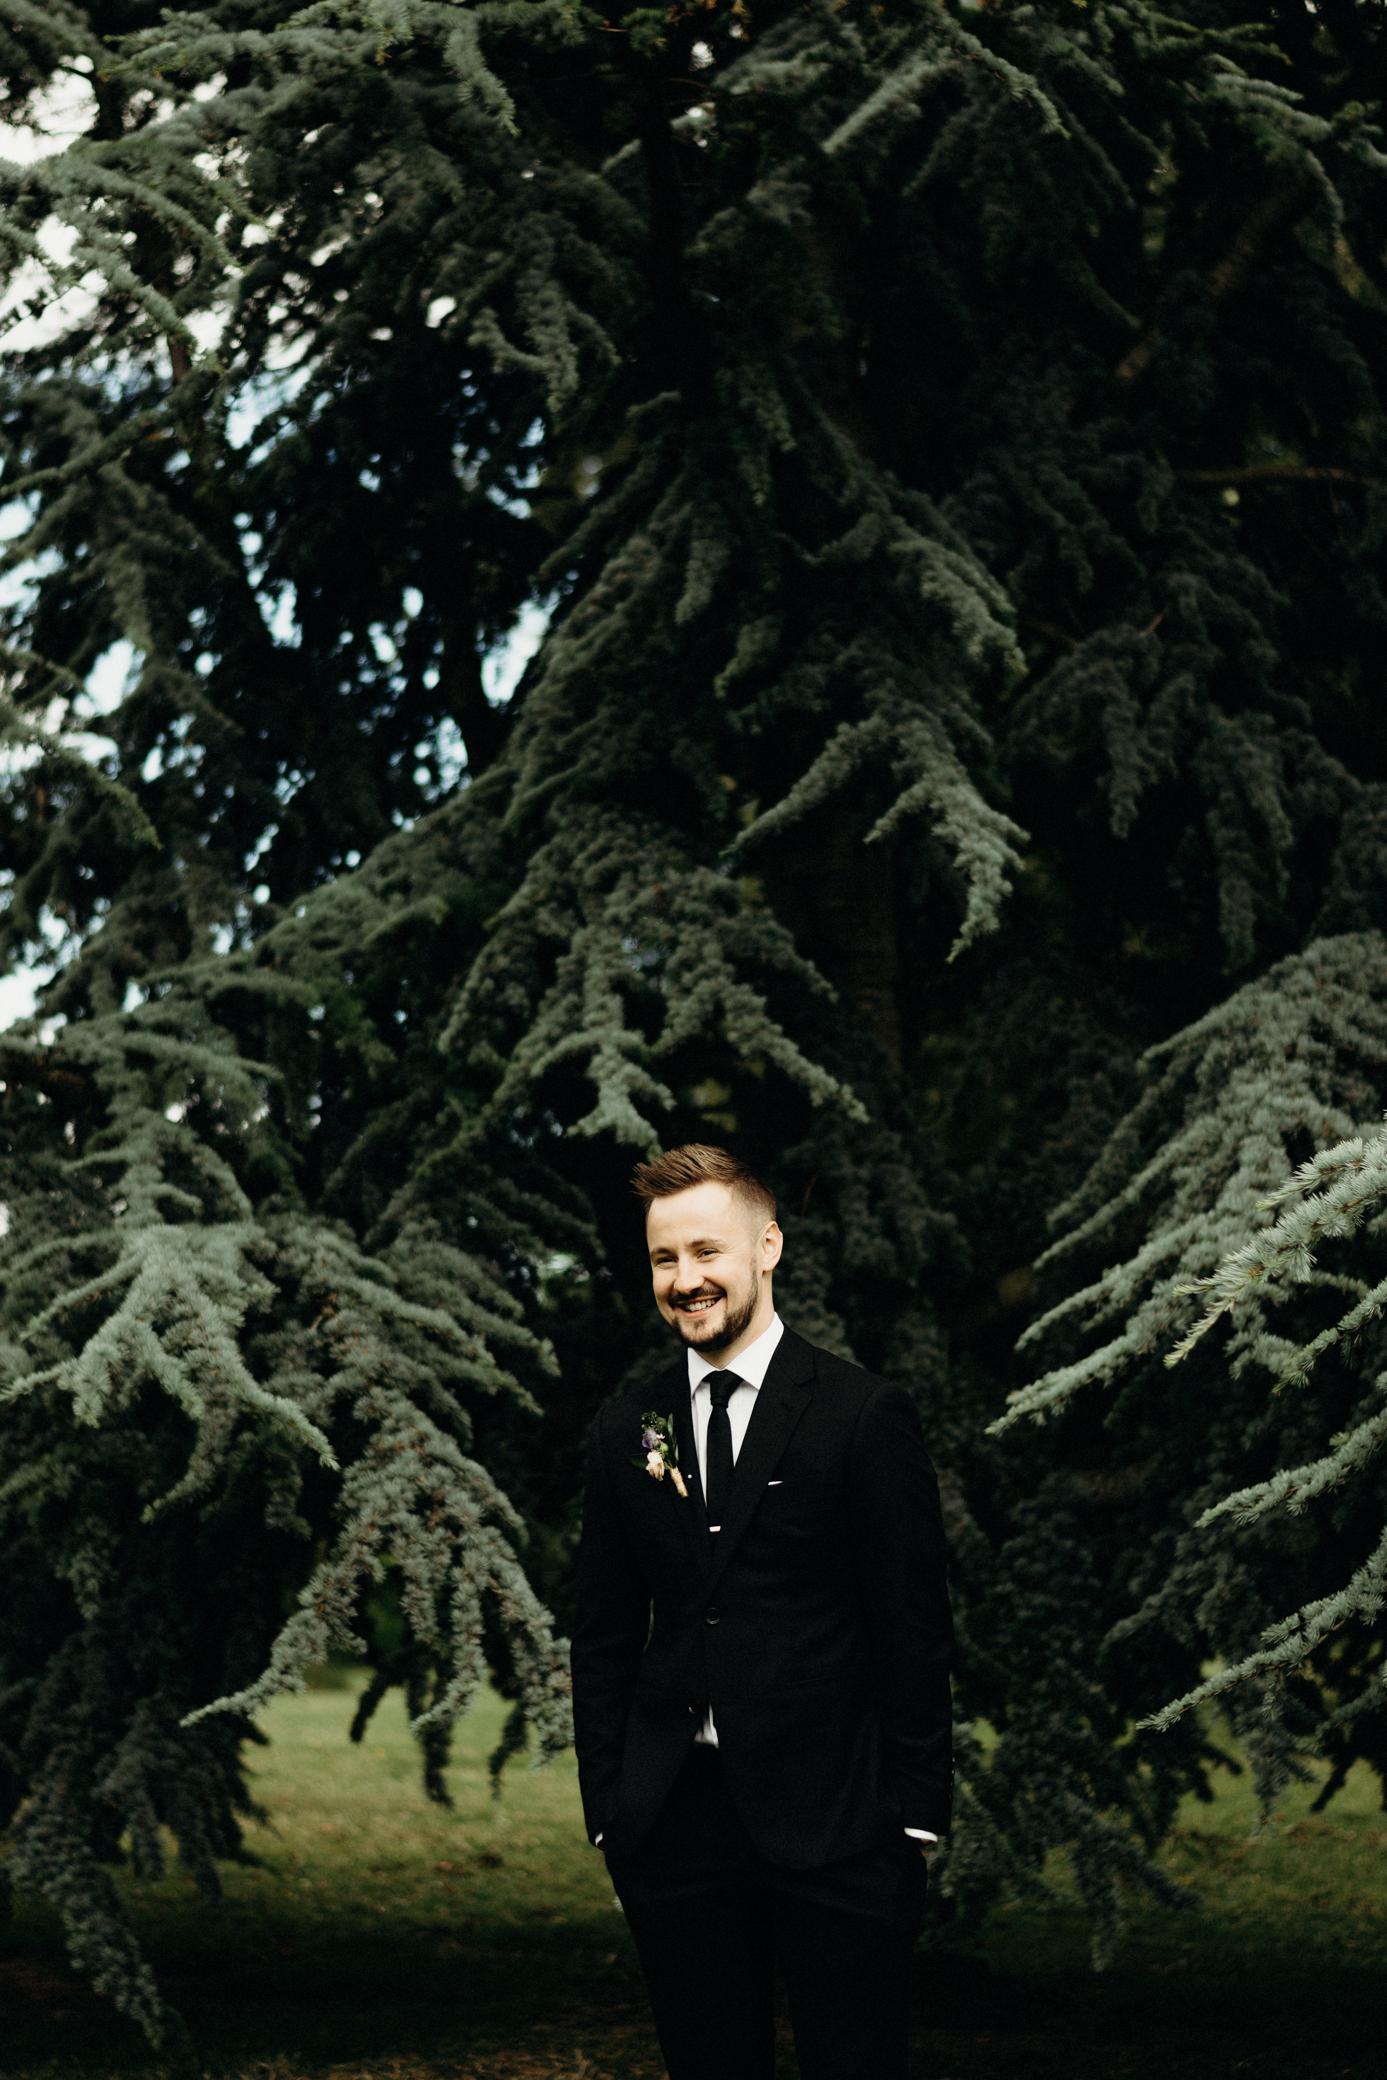 Alan&Naz- Barberstown Castle Wedding - Wedding photographer Ireland-156.jpg